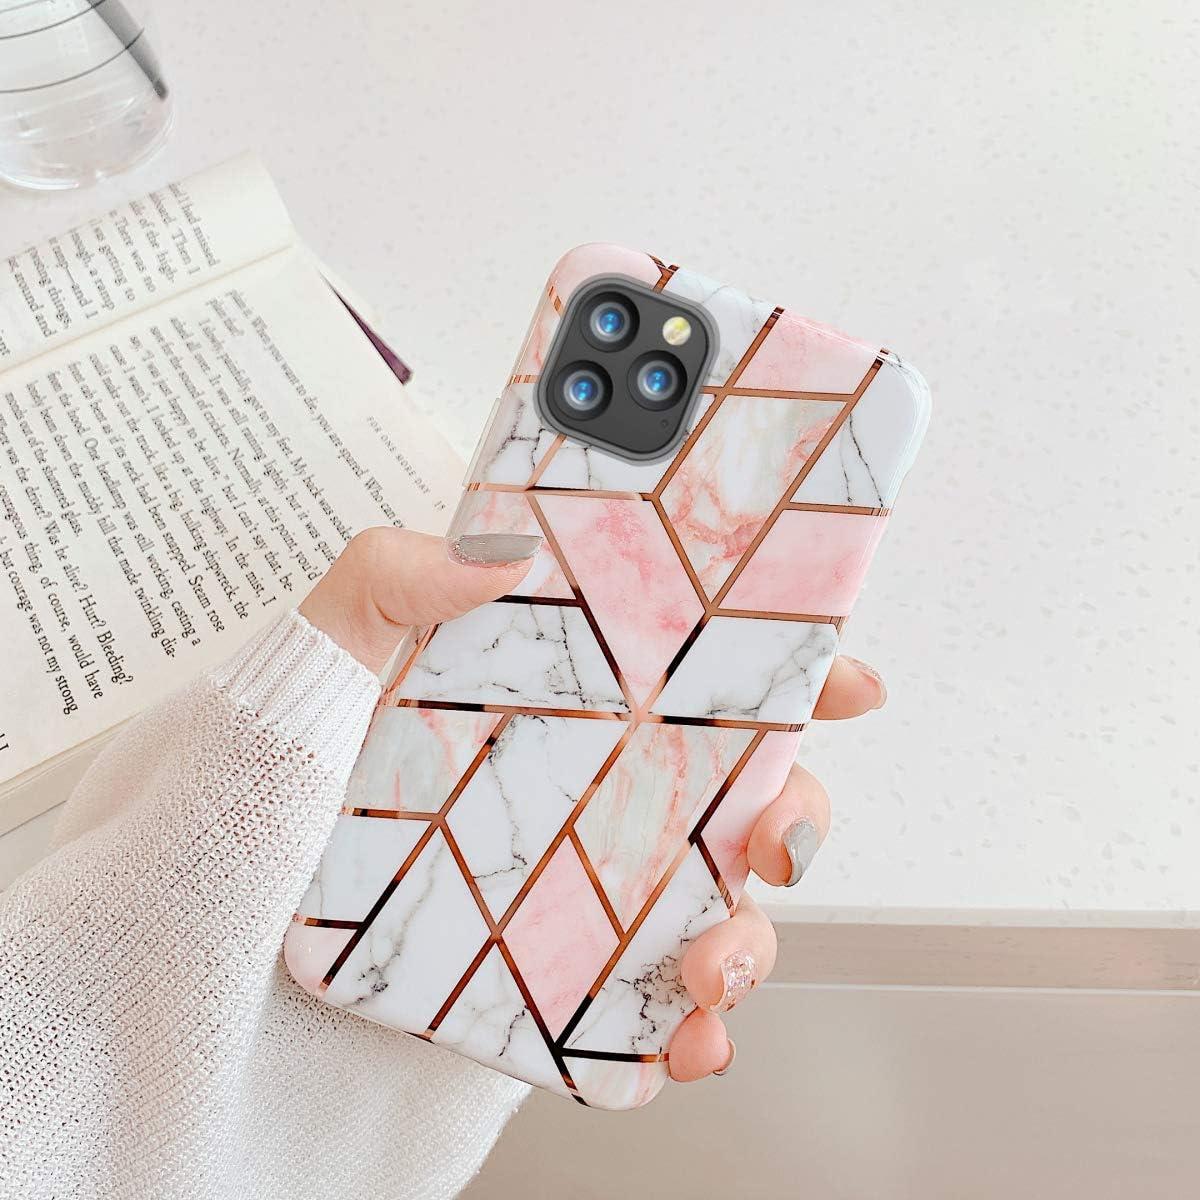 Arbre Oihxse Compatible pour iPhone 11 2019 6.1 Coque Marbre Motif Stitching Crystal Ultra-Mince Protection Housse en Silicone TPU Souple Flexible Bumper Anti Choc Etui Case